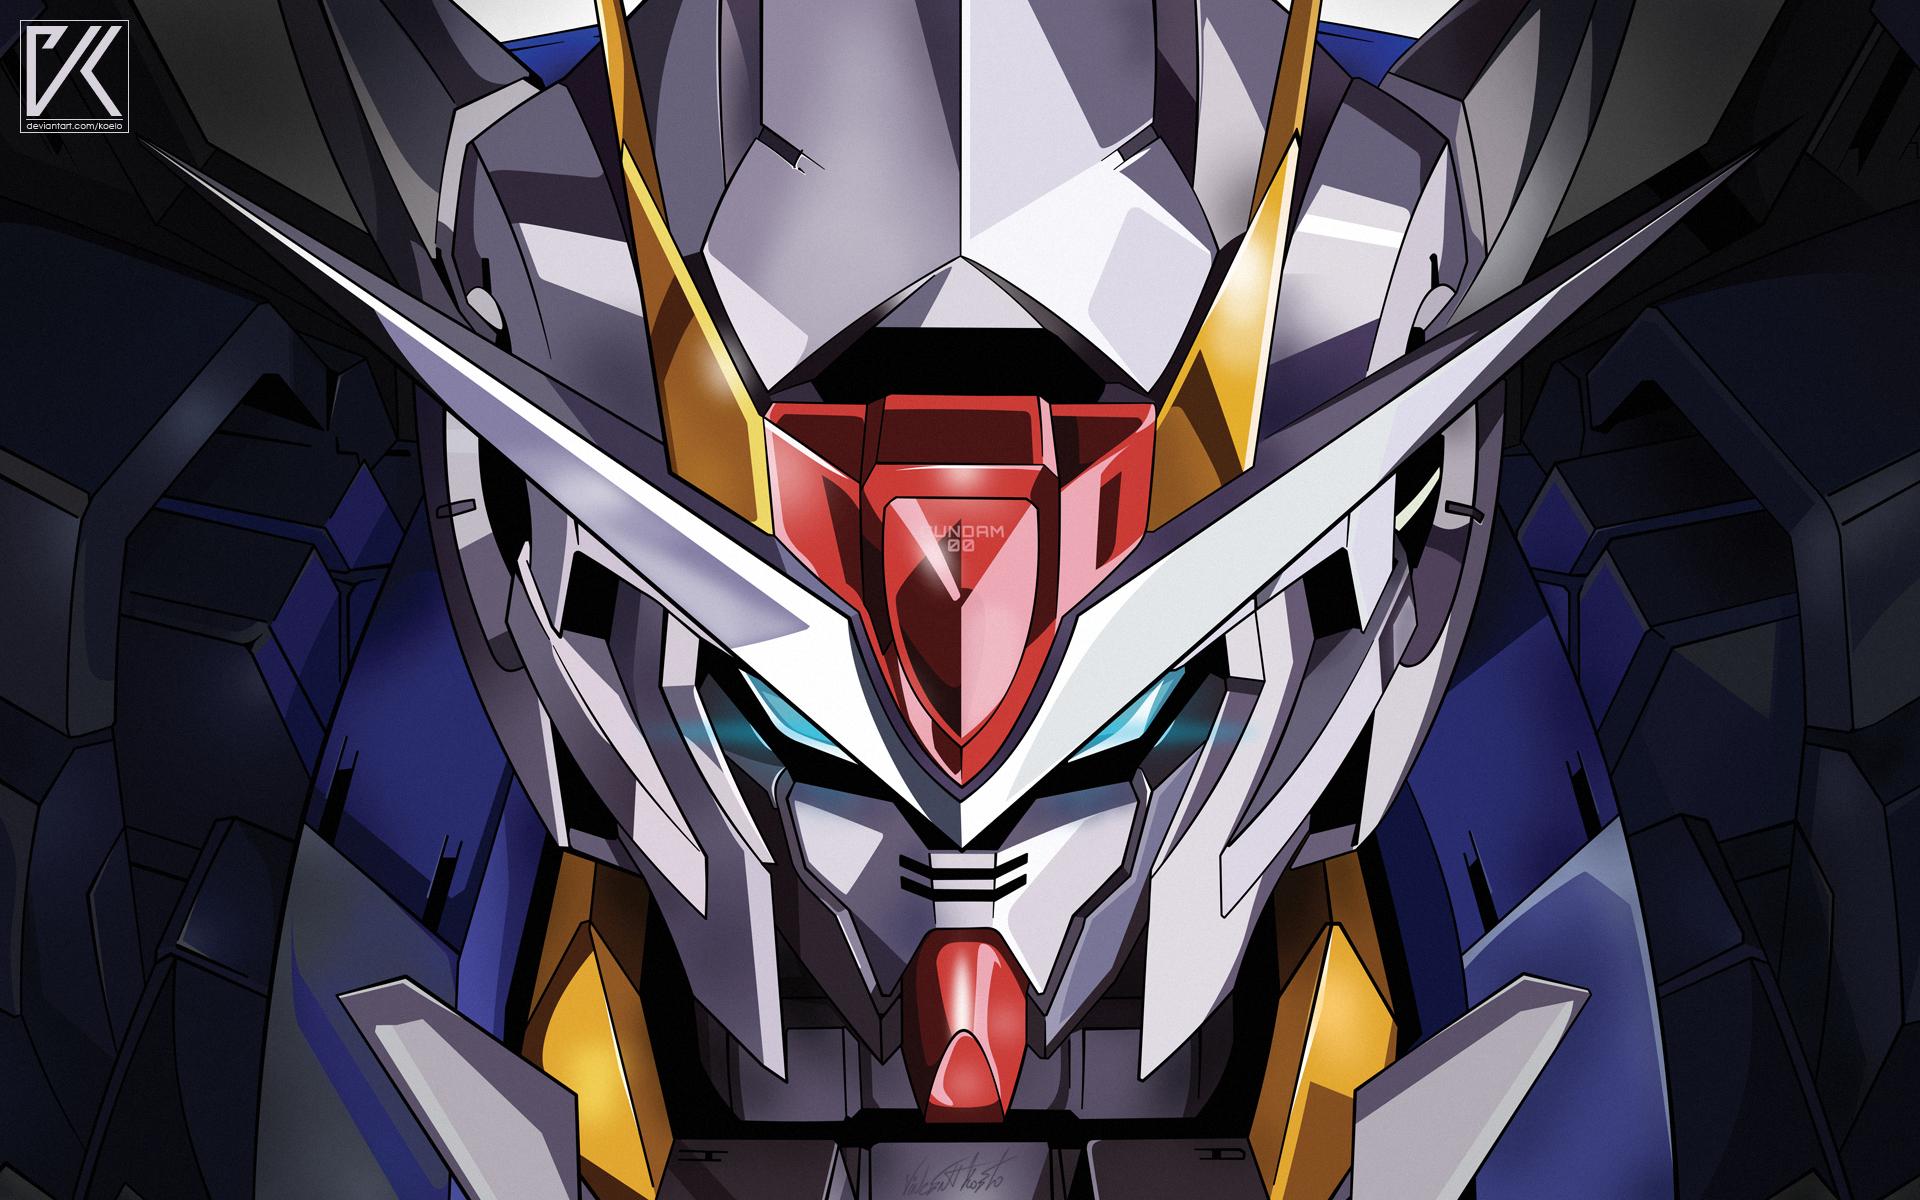 Anime 1920x1200 Gundam Gundam 00 exia Mobile Suit Gundam Mobile Suit Gundam 00 robot anime